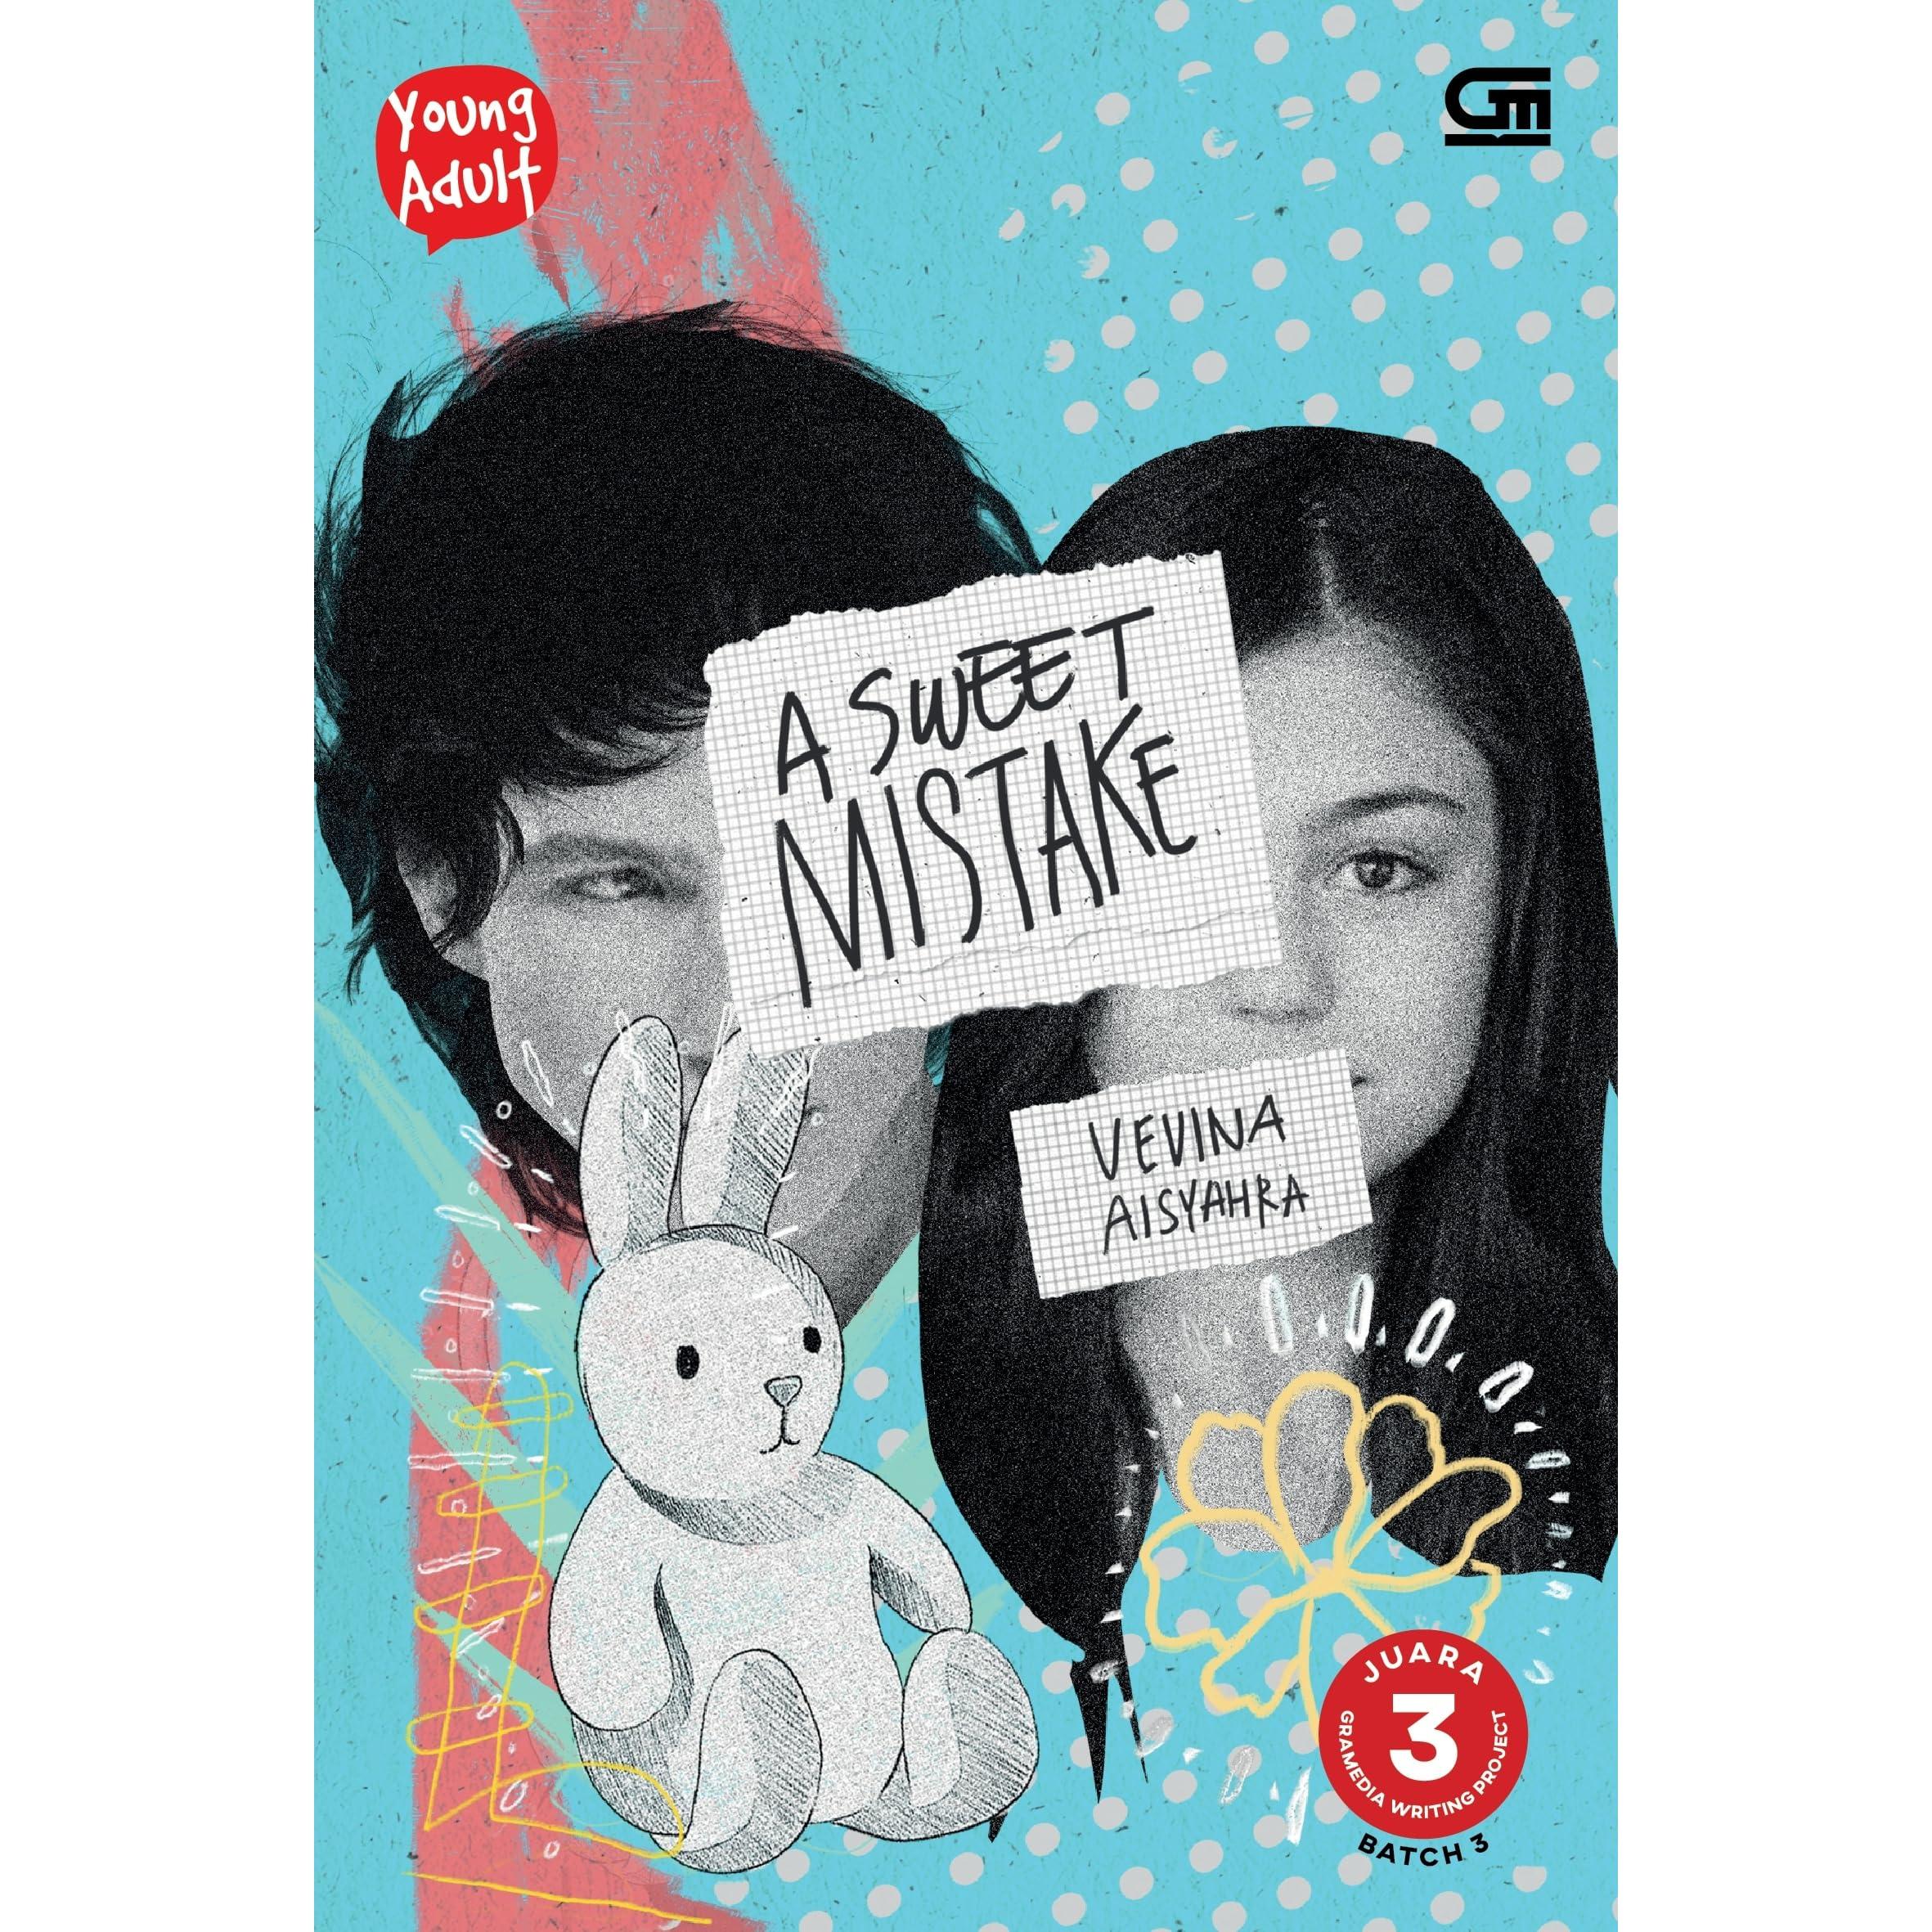 A Sweet Mistake by Vevina Aisyahra